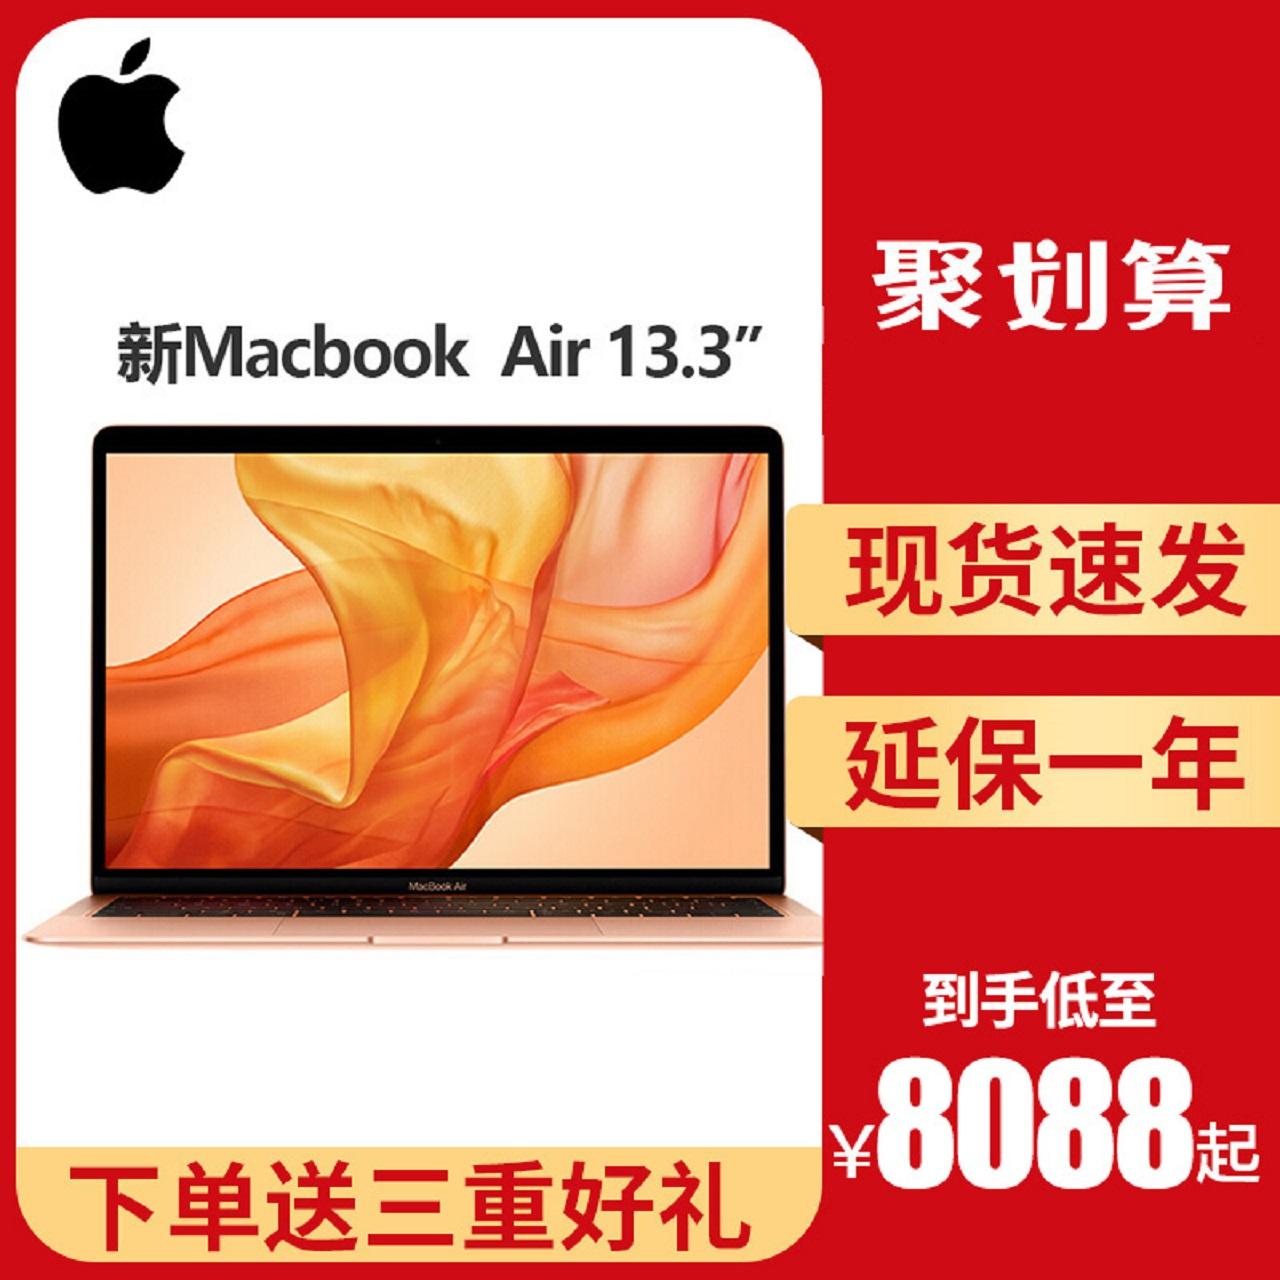 APPLE/苹果 MacBook air 13.3英寸笔记本电脑2018年新款超薄商务笔记本